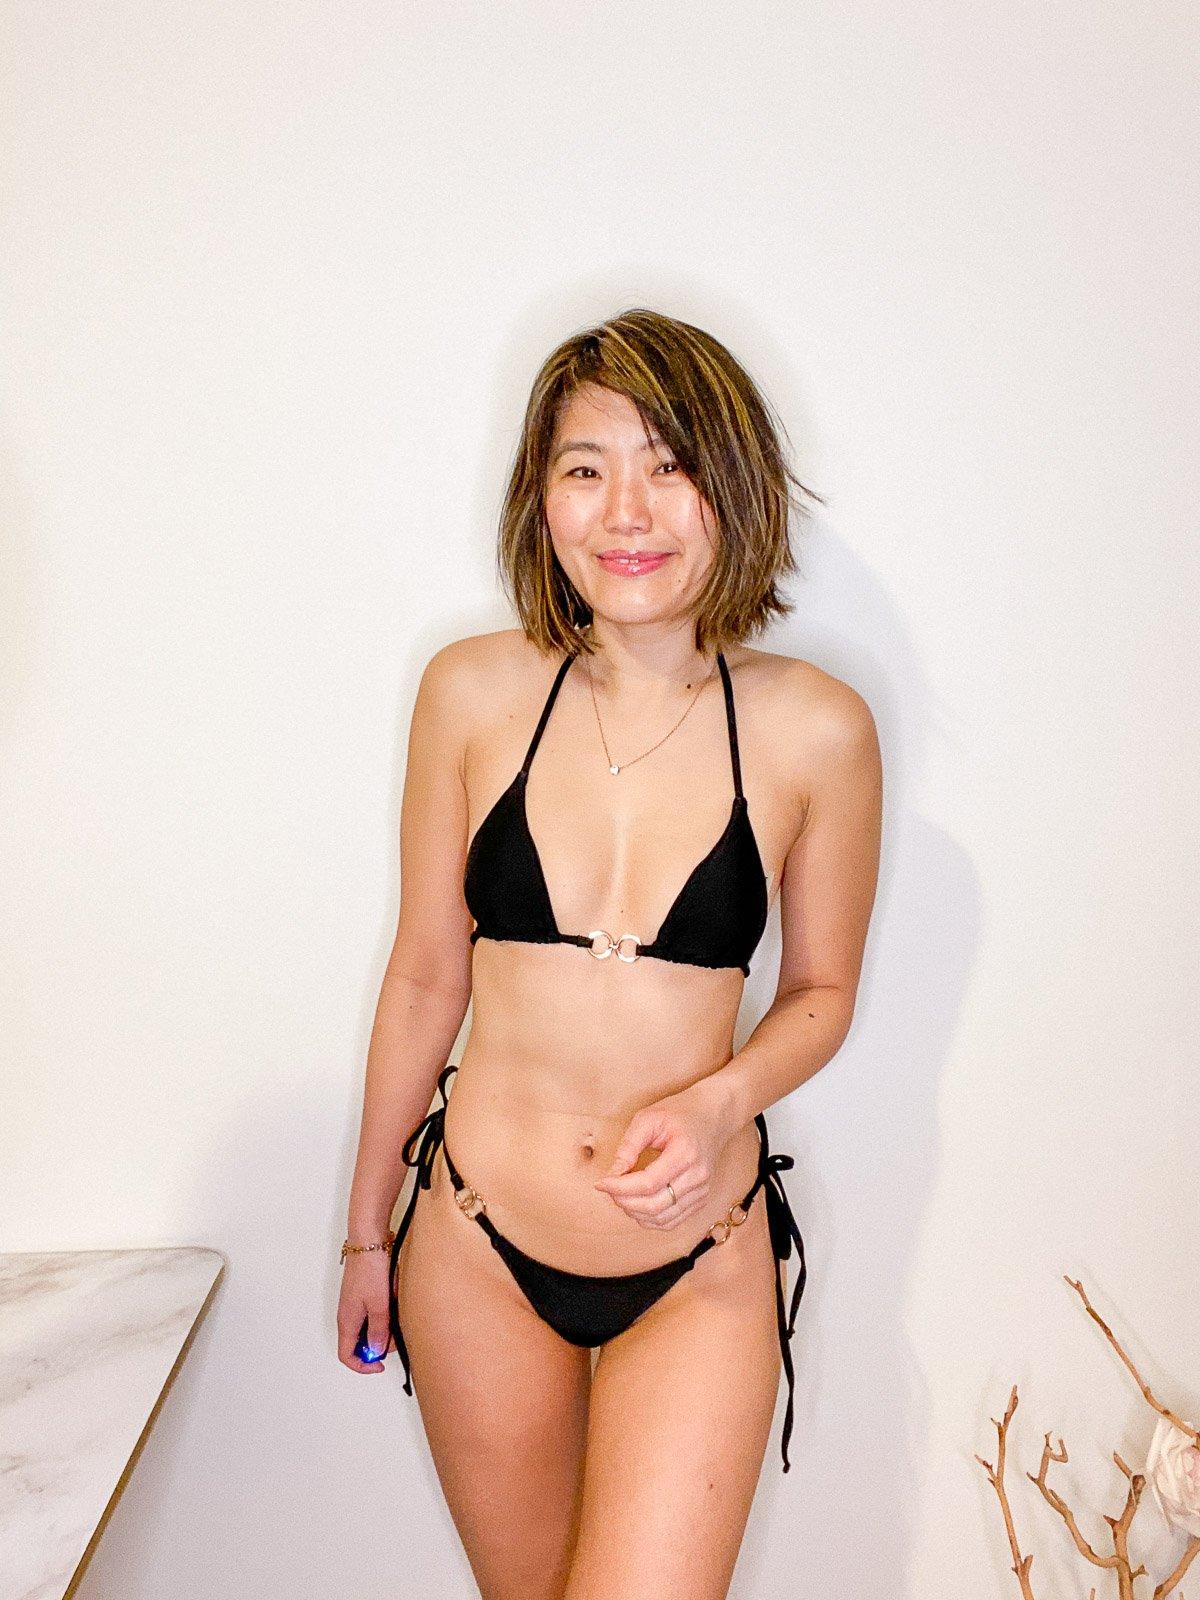 shein triangle bikini review